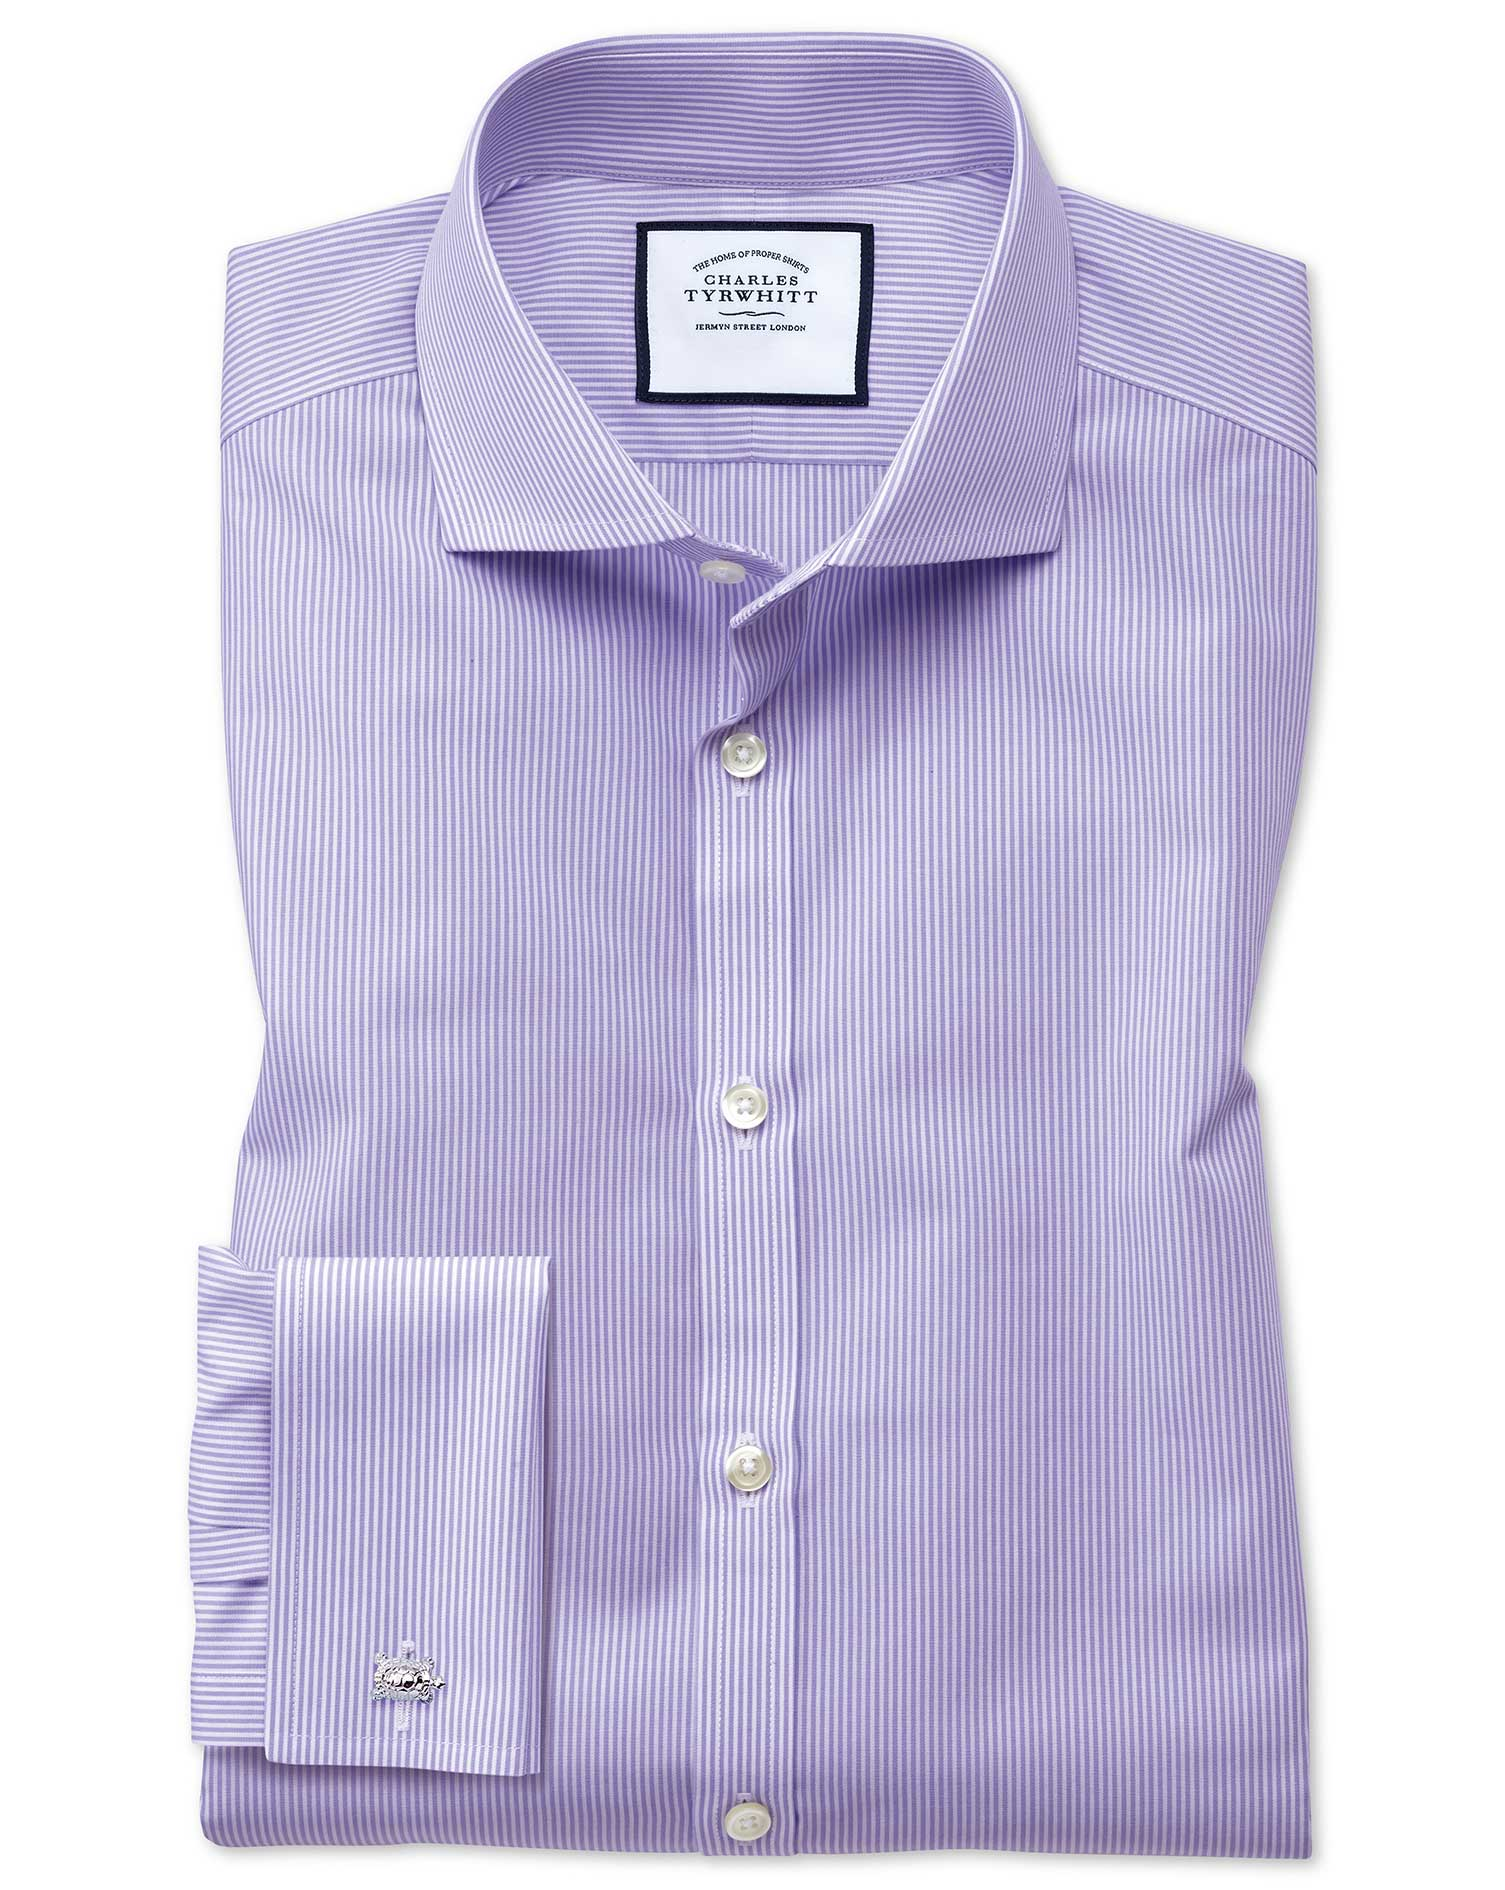 Extra Slim Fit Cutaway Collar Non-Iron Bengal Stripe Lilac Cotton Formal Shirt Single Cuff Size 15/3